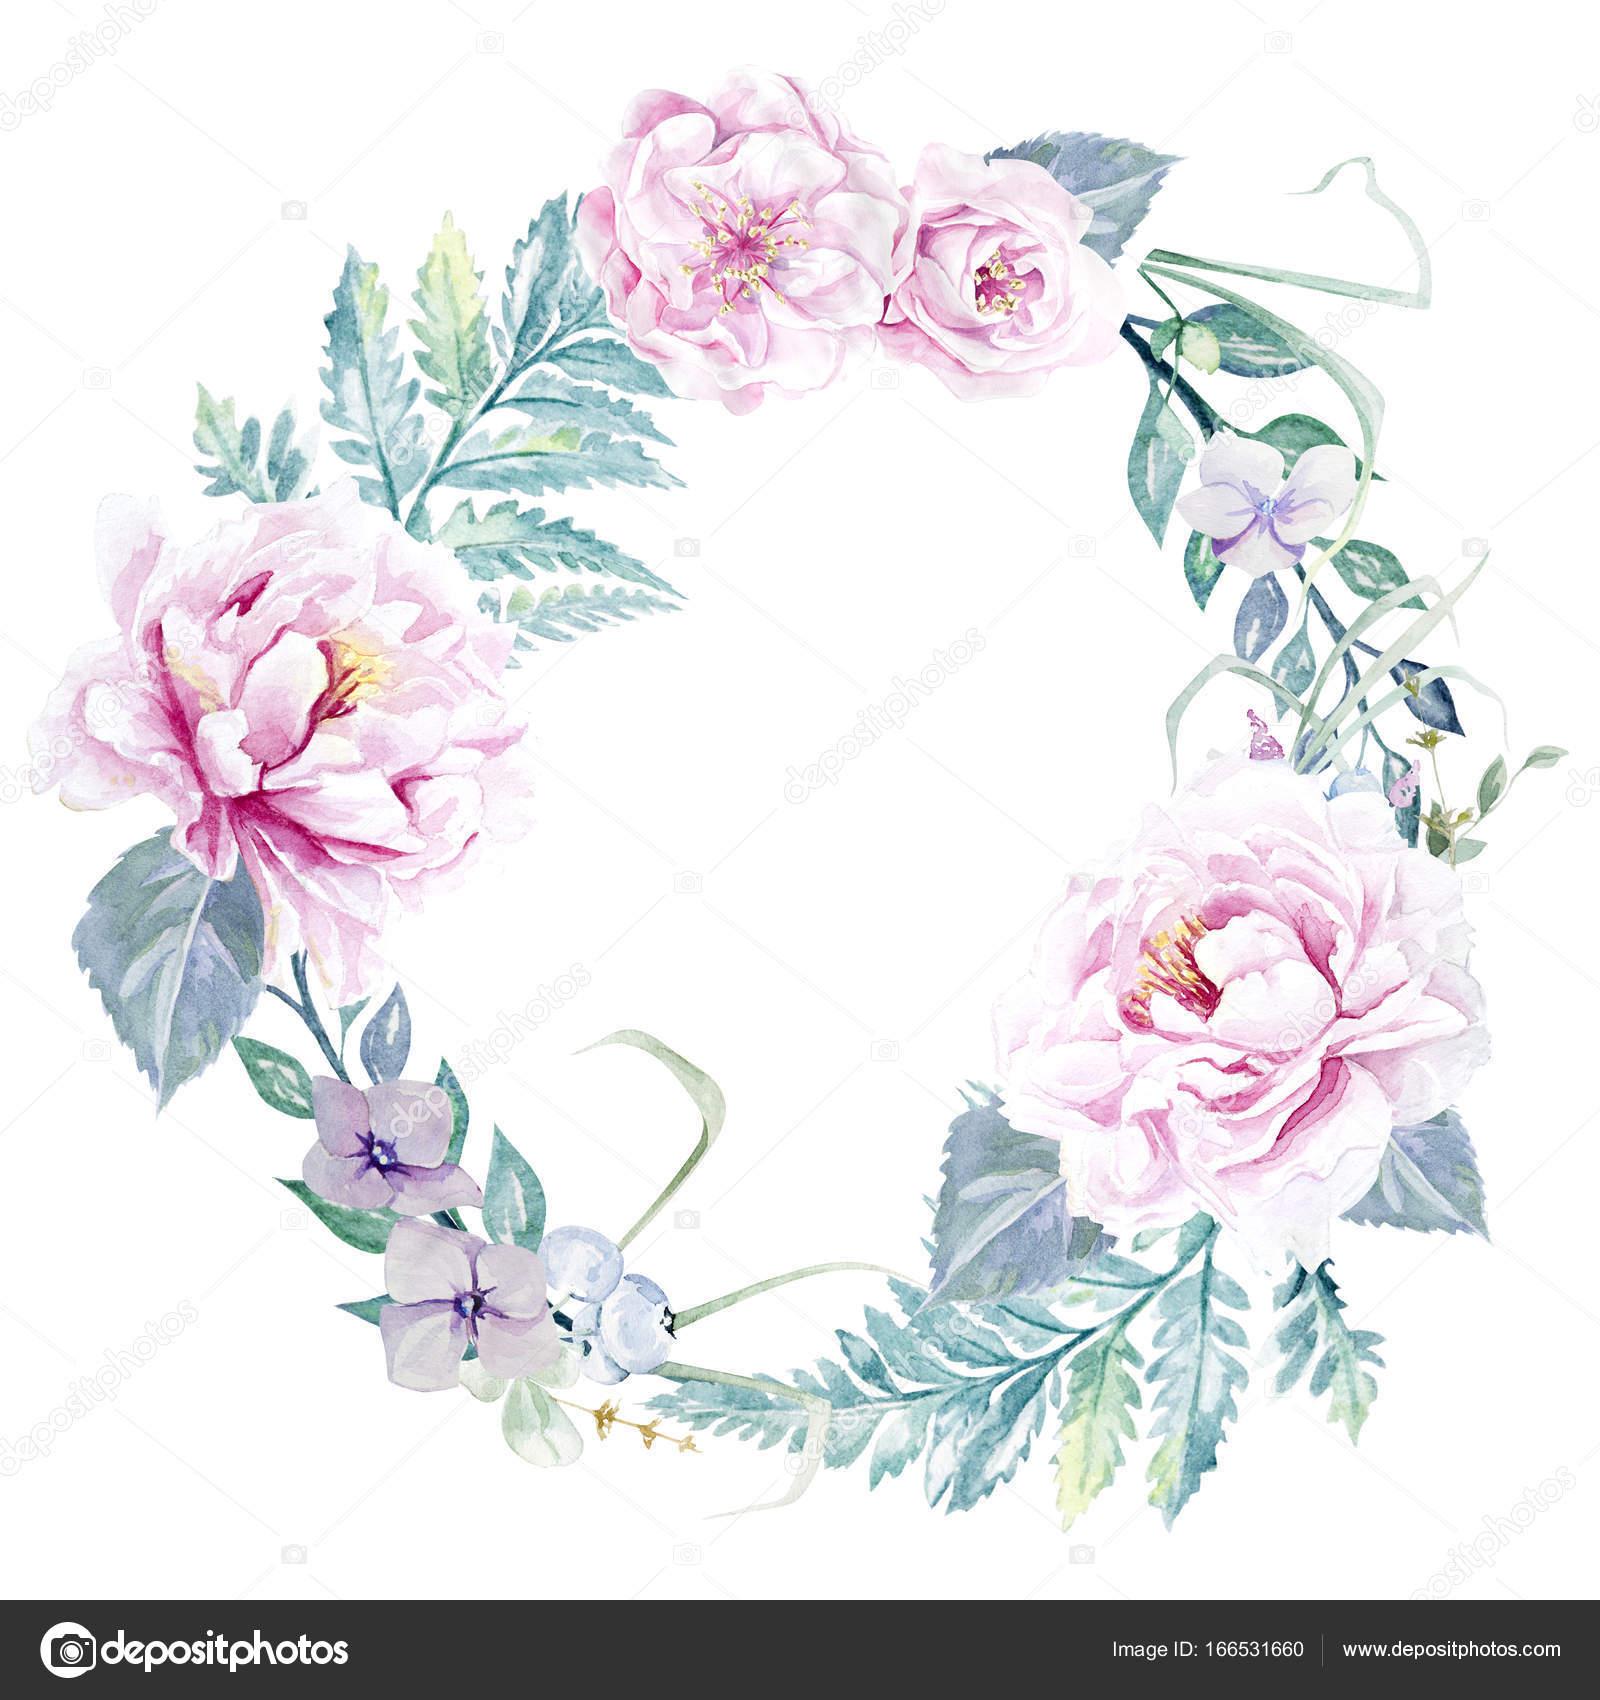 Aquarell Blumenrahmen Vorlage — Stockfoto © maryswell #166531660